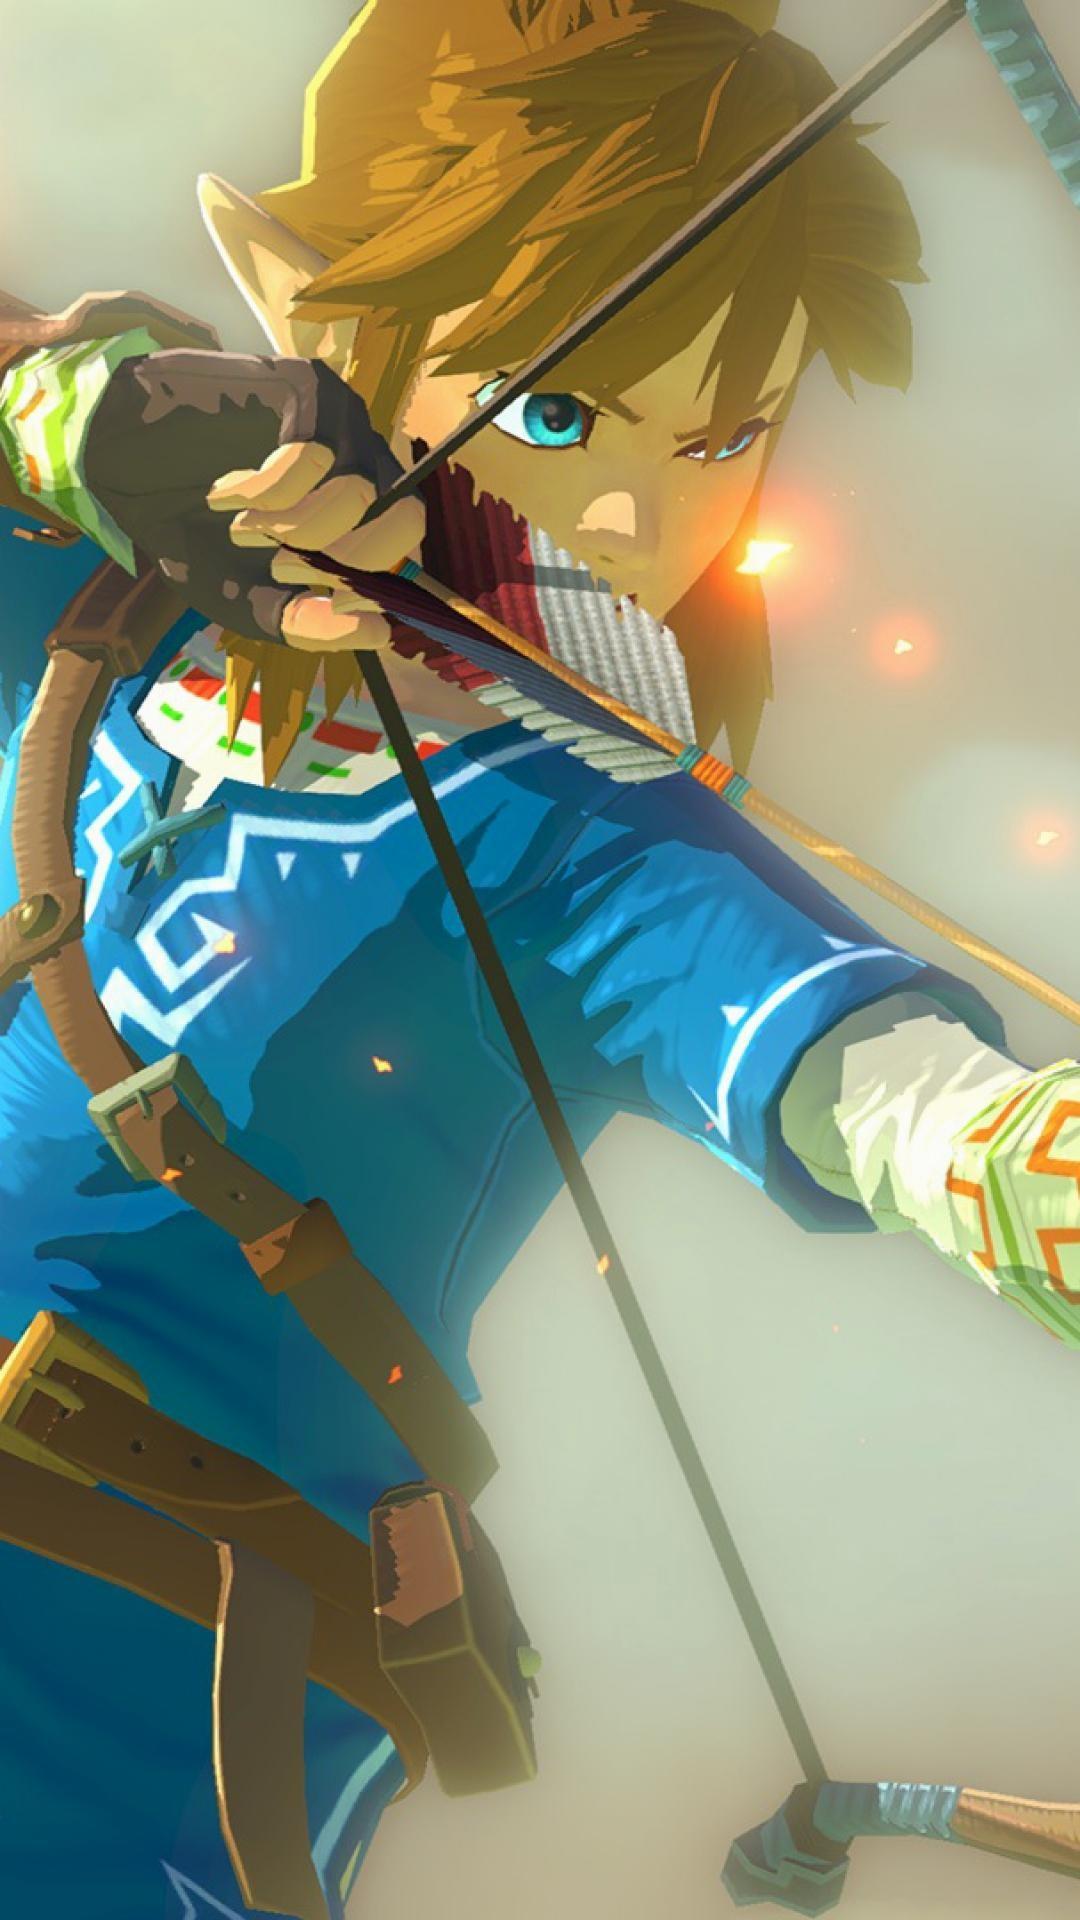 wallpaper.wiki-Zelda-Iphone-Image-Free-Download-PIC-